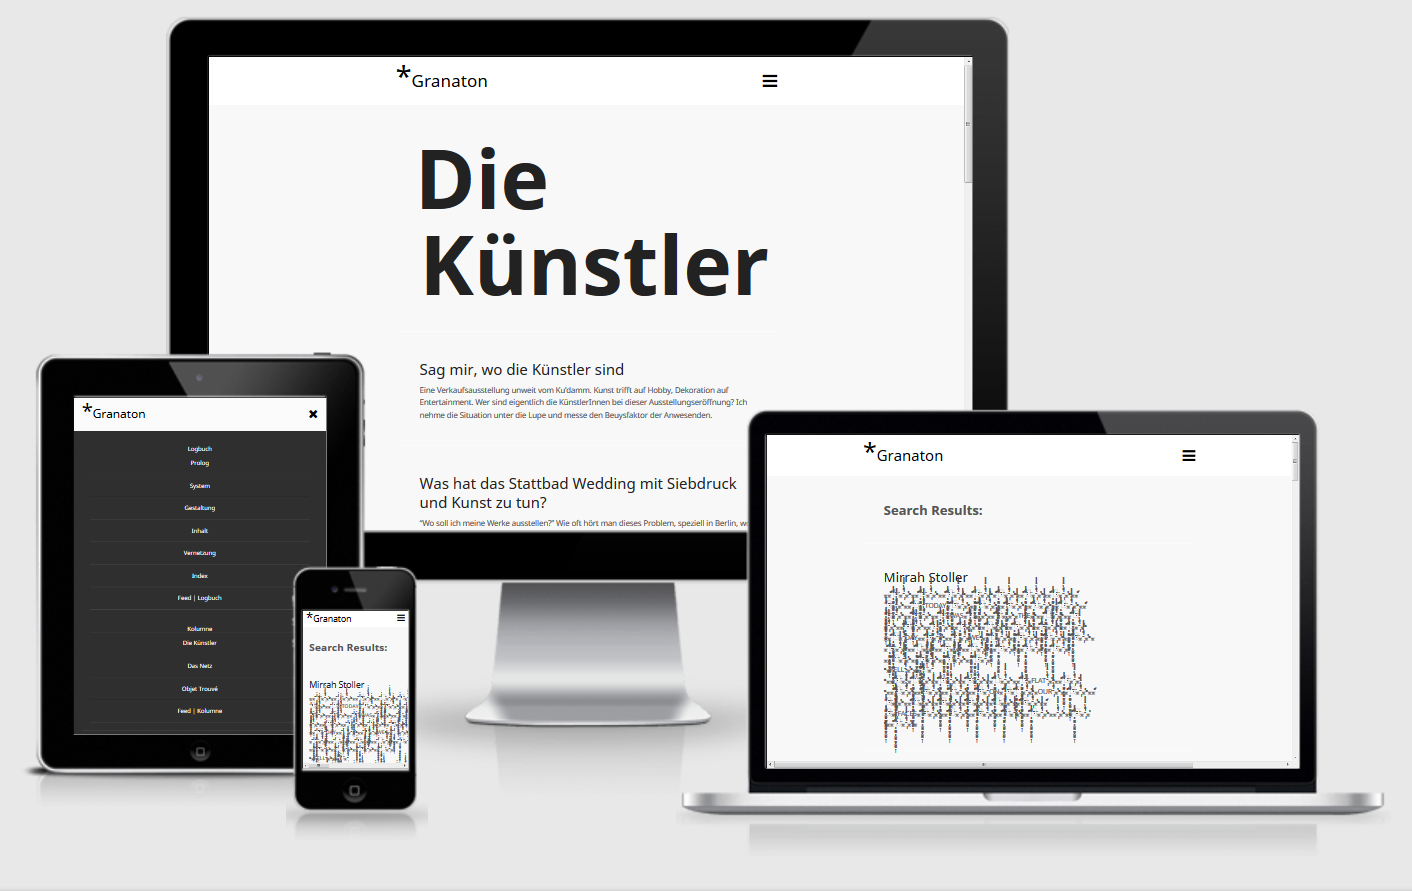 Free Wordpress Themes Wunderkammer Granaton